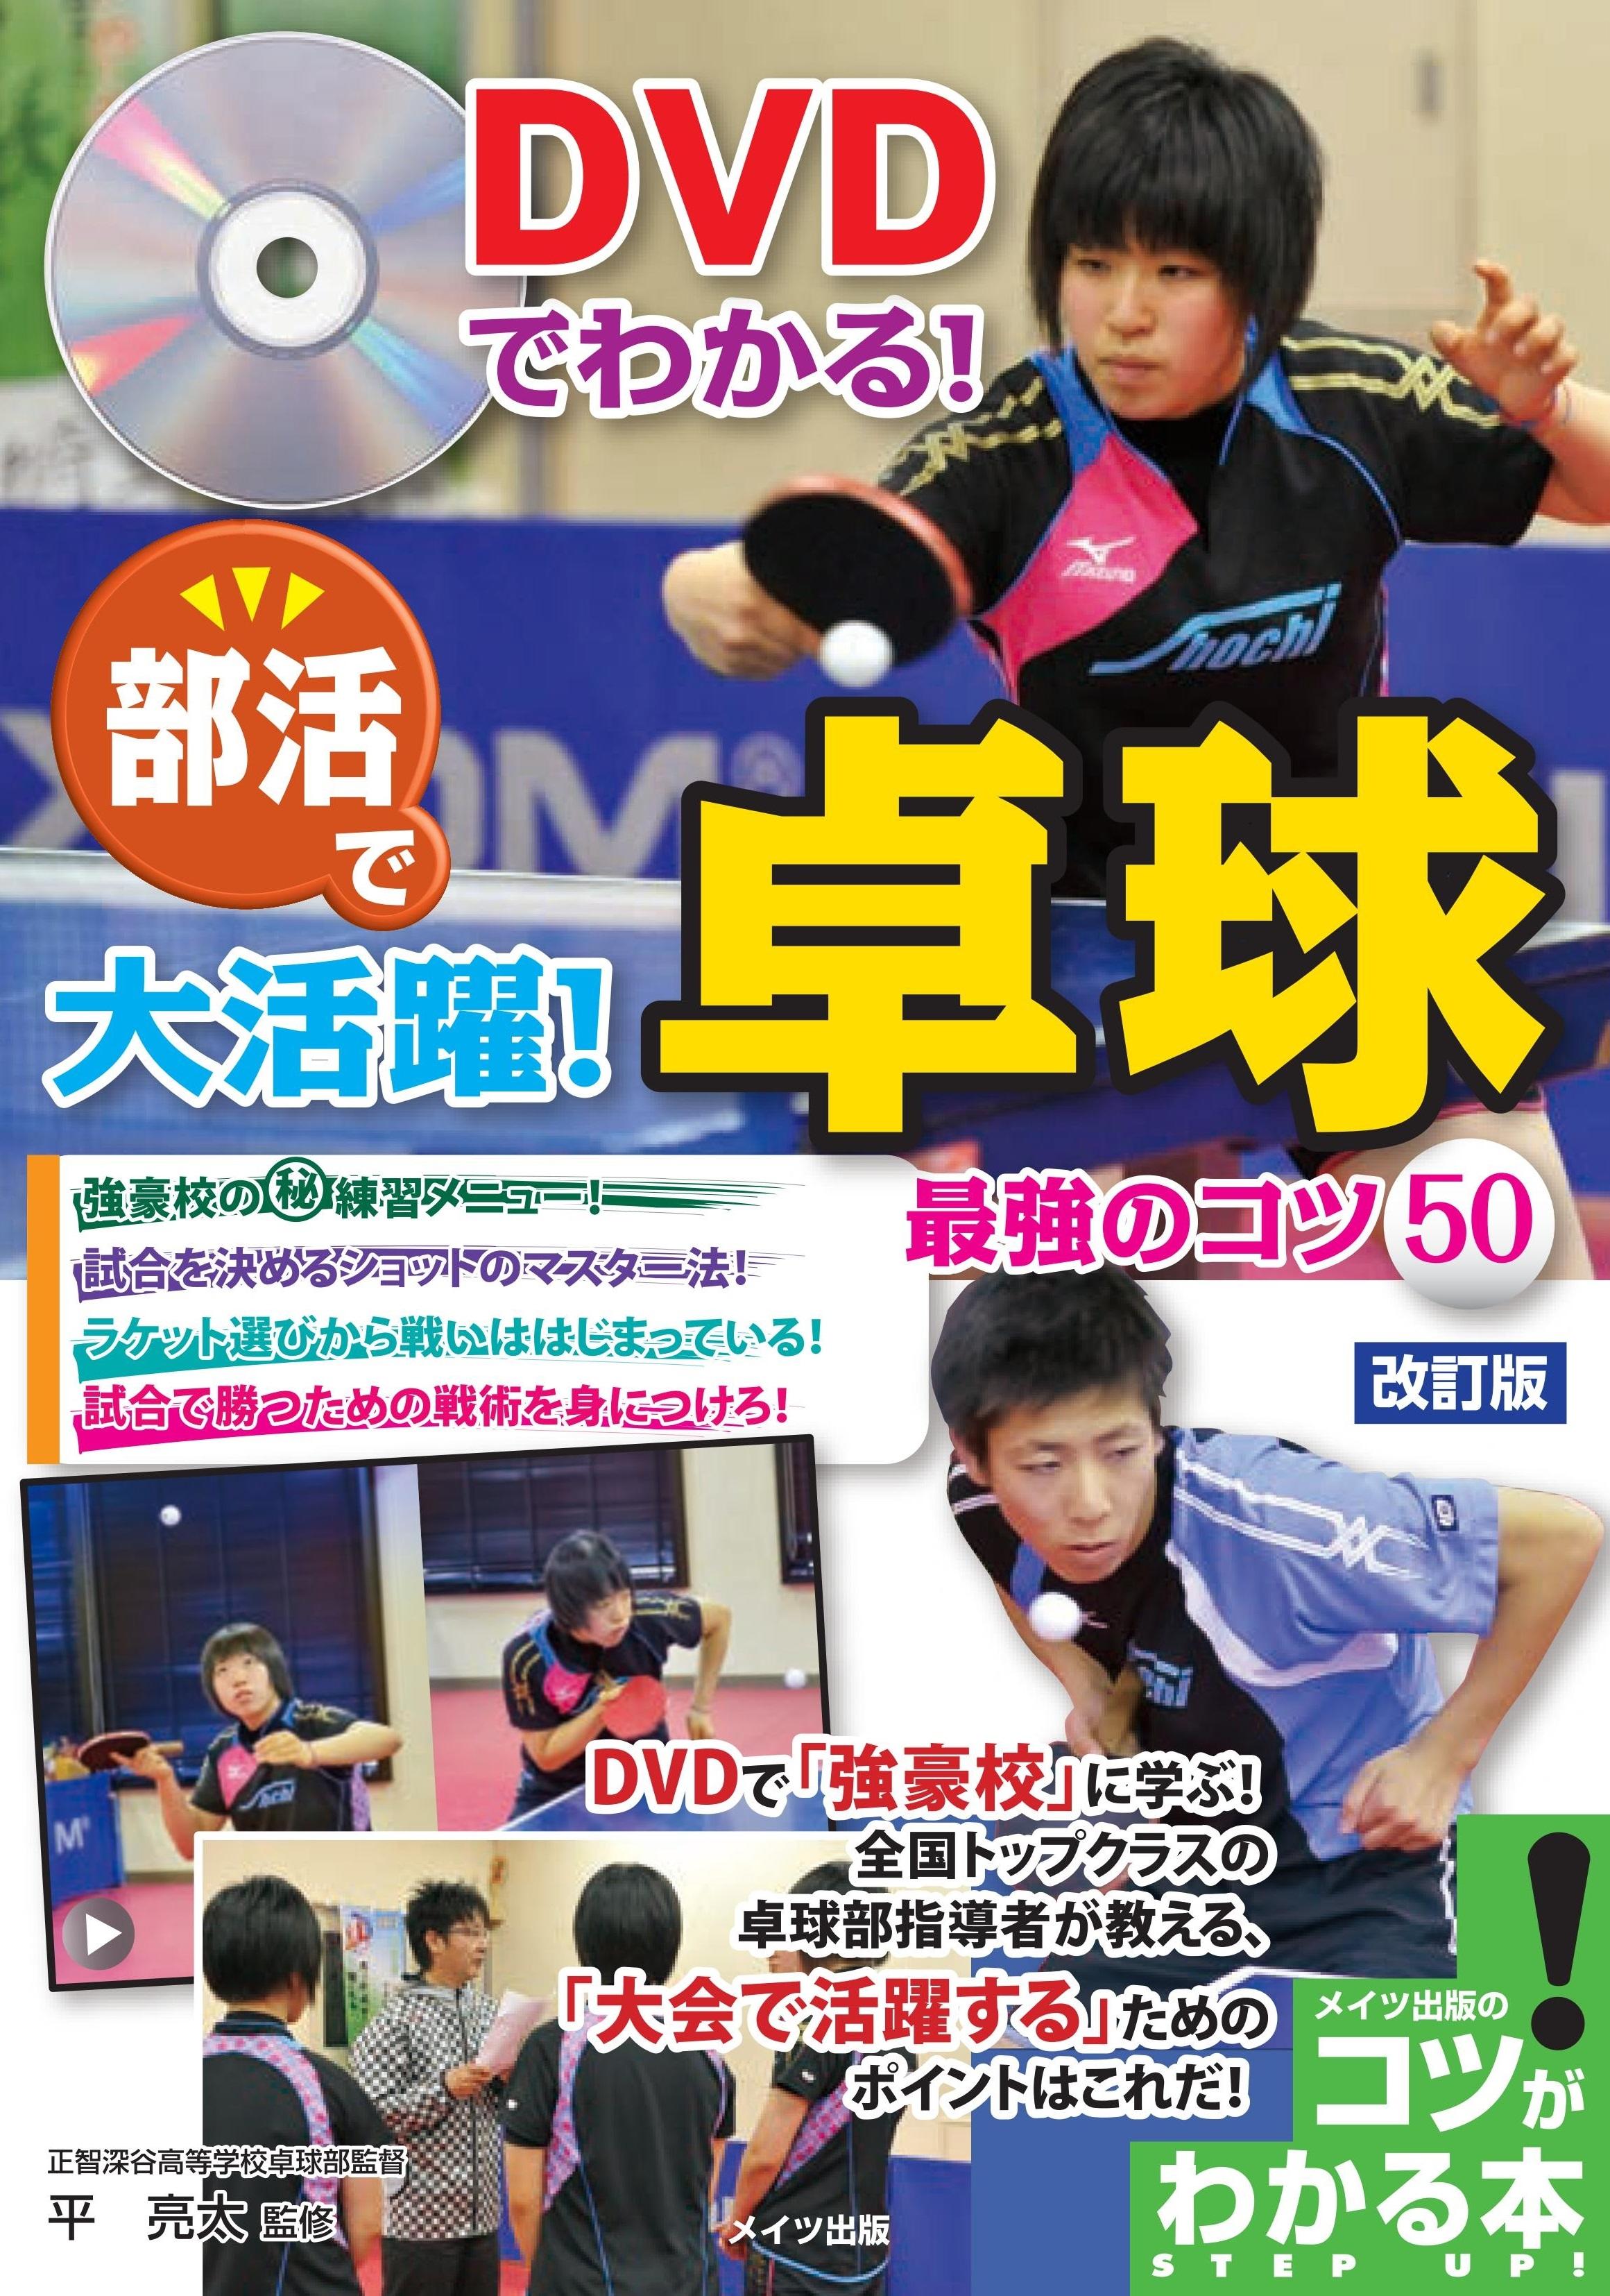 DVDでわかる! 部活で大活躍! 卓球 最強のコツ50 改訂版 【DVDなし】